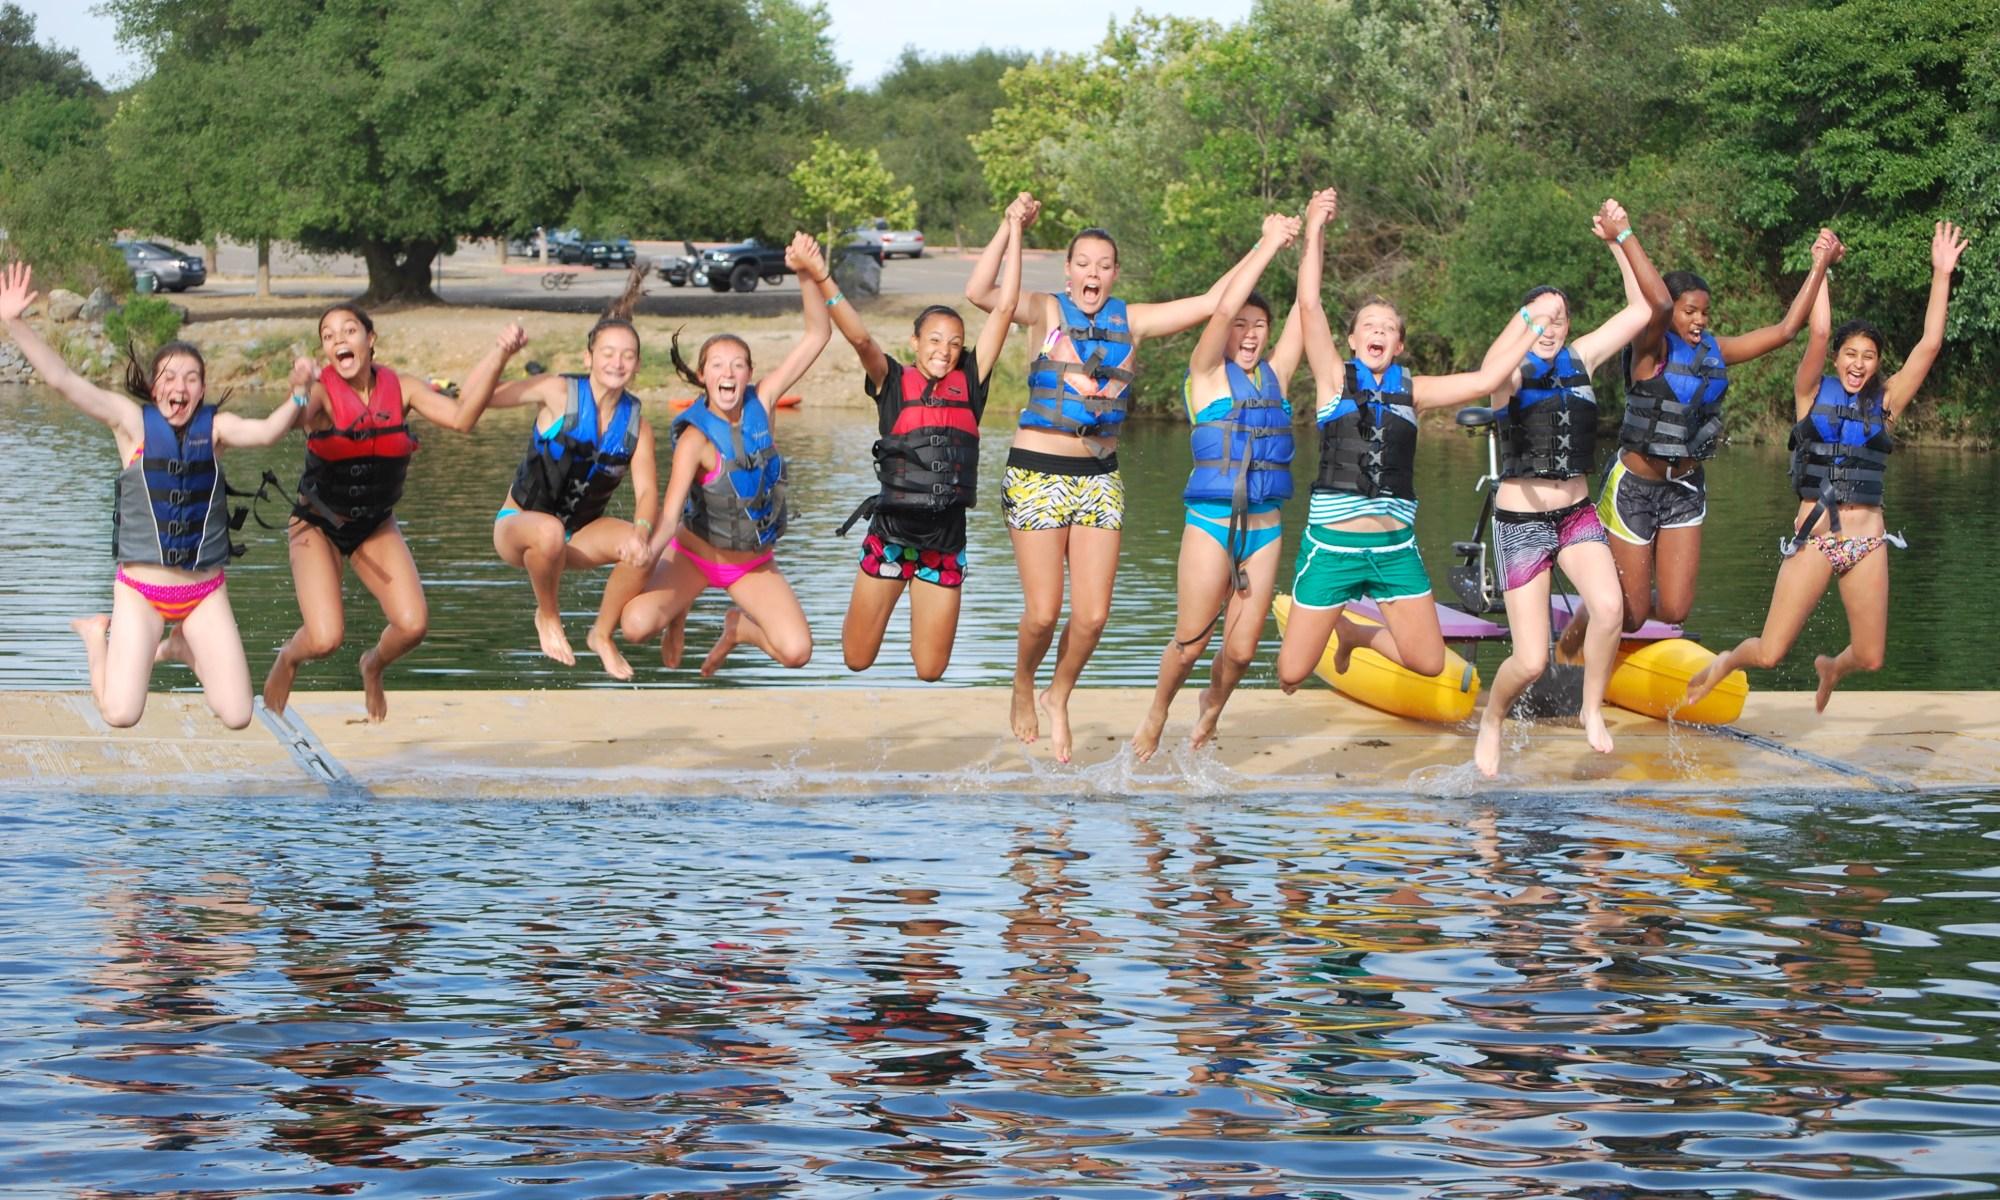 sacramento state aquatic centre kids jumping into the lake